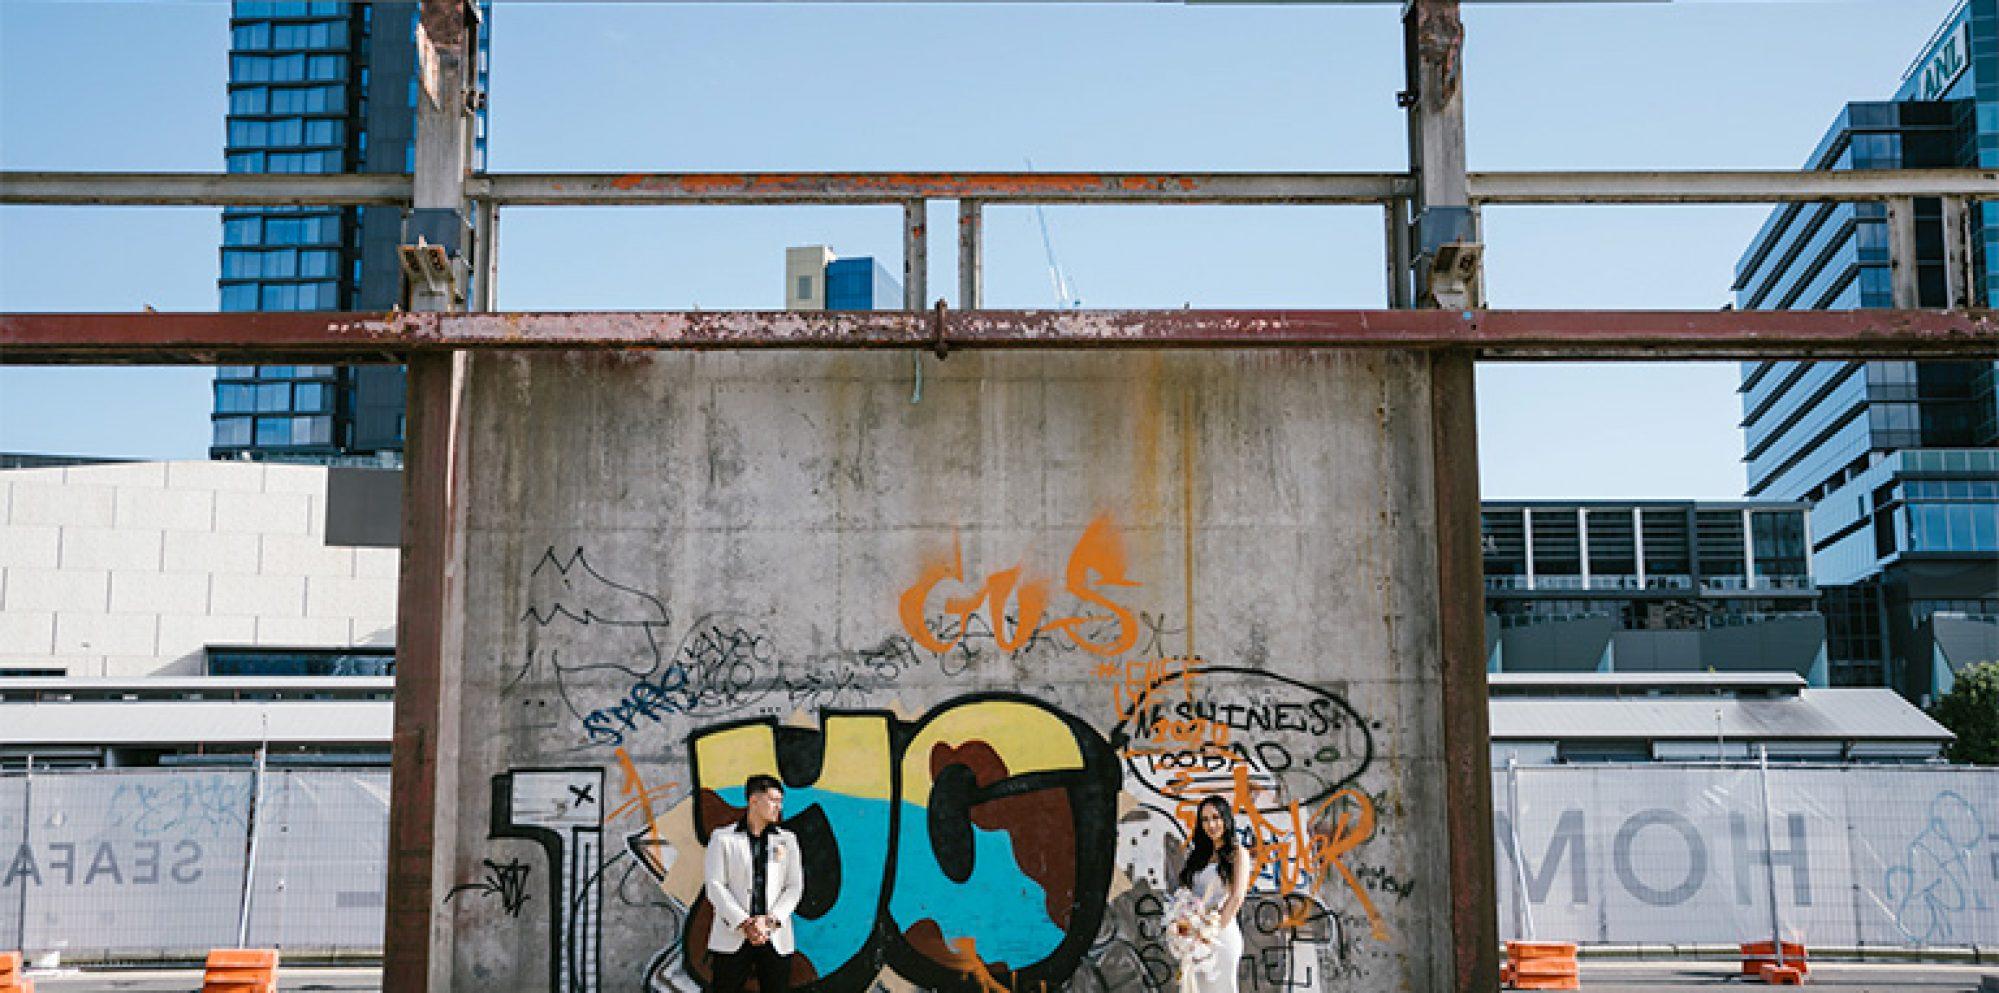 Jayde & daniel melbourne wedding videography @ the cargo hall